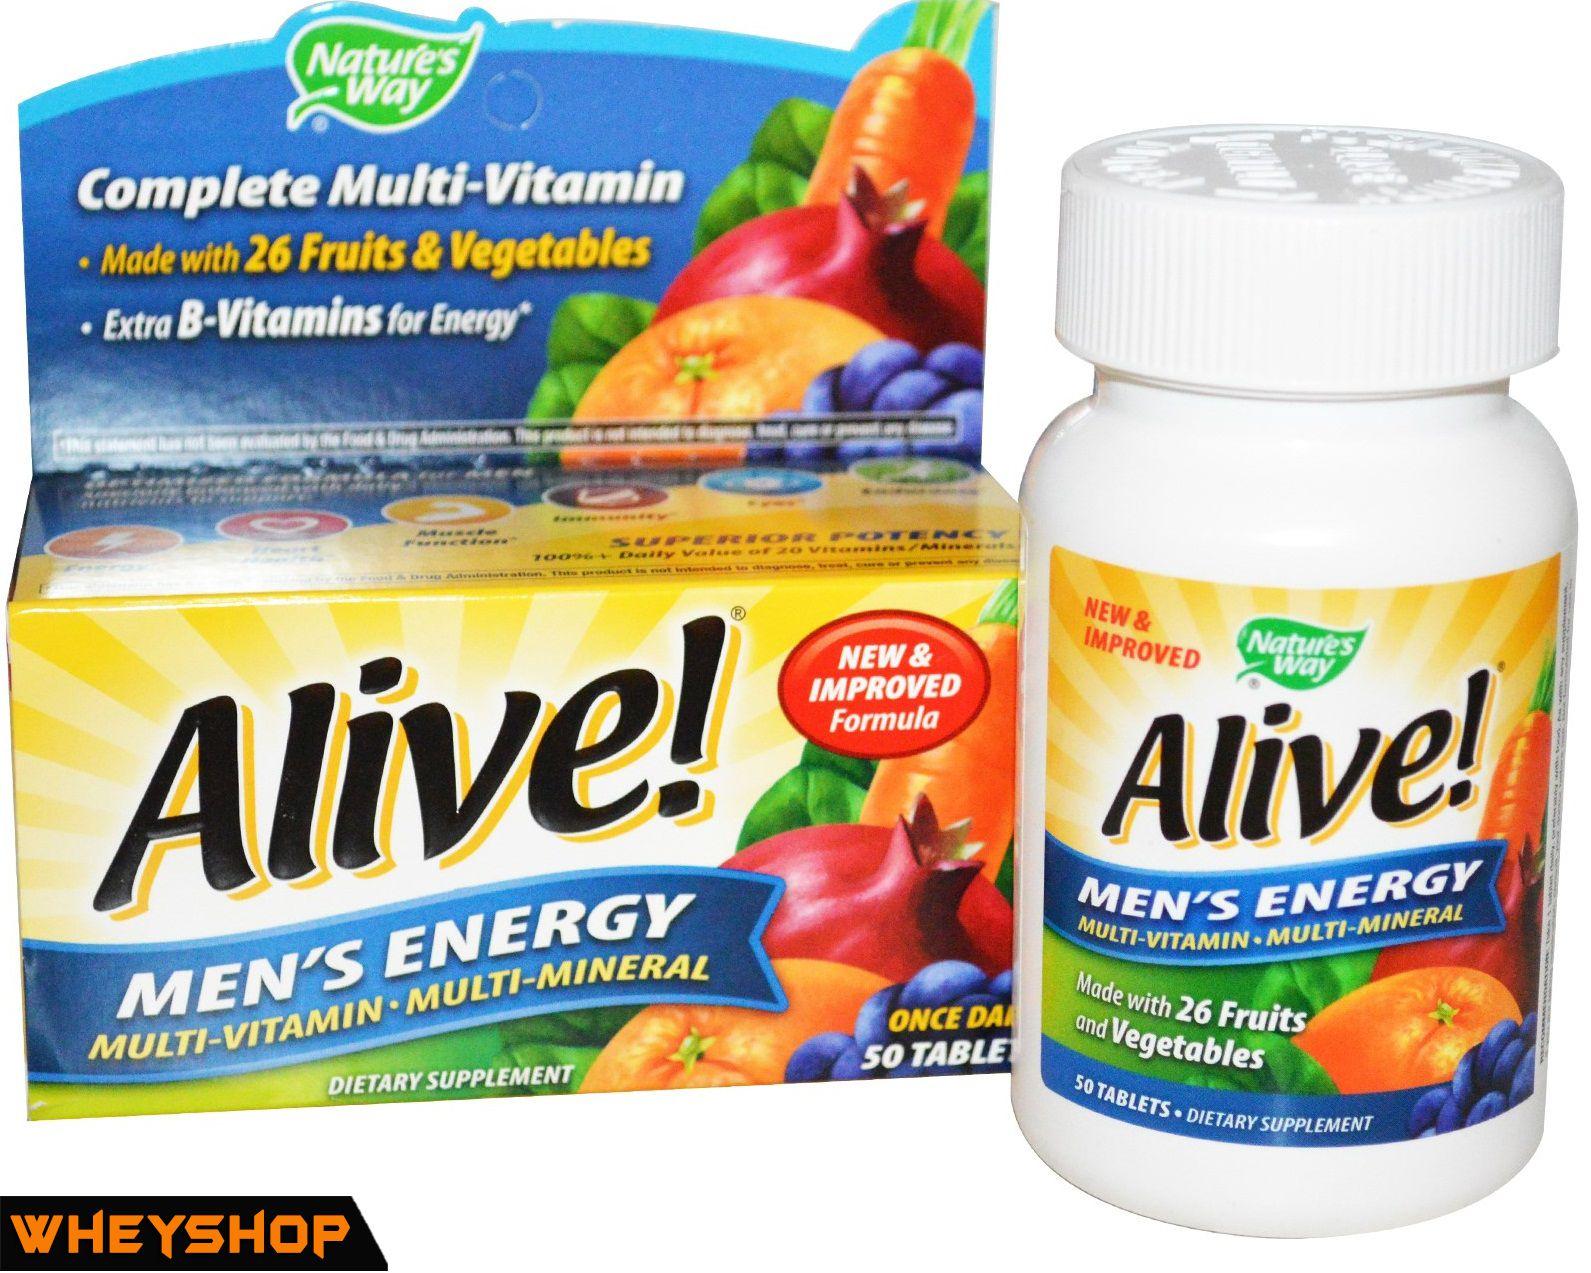 vitamin-tong-hop-cho-nam-nature-way-chiaki-vn1-jpg-1489477256-14032017144056_compressed